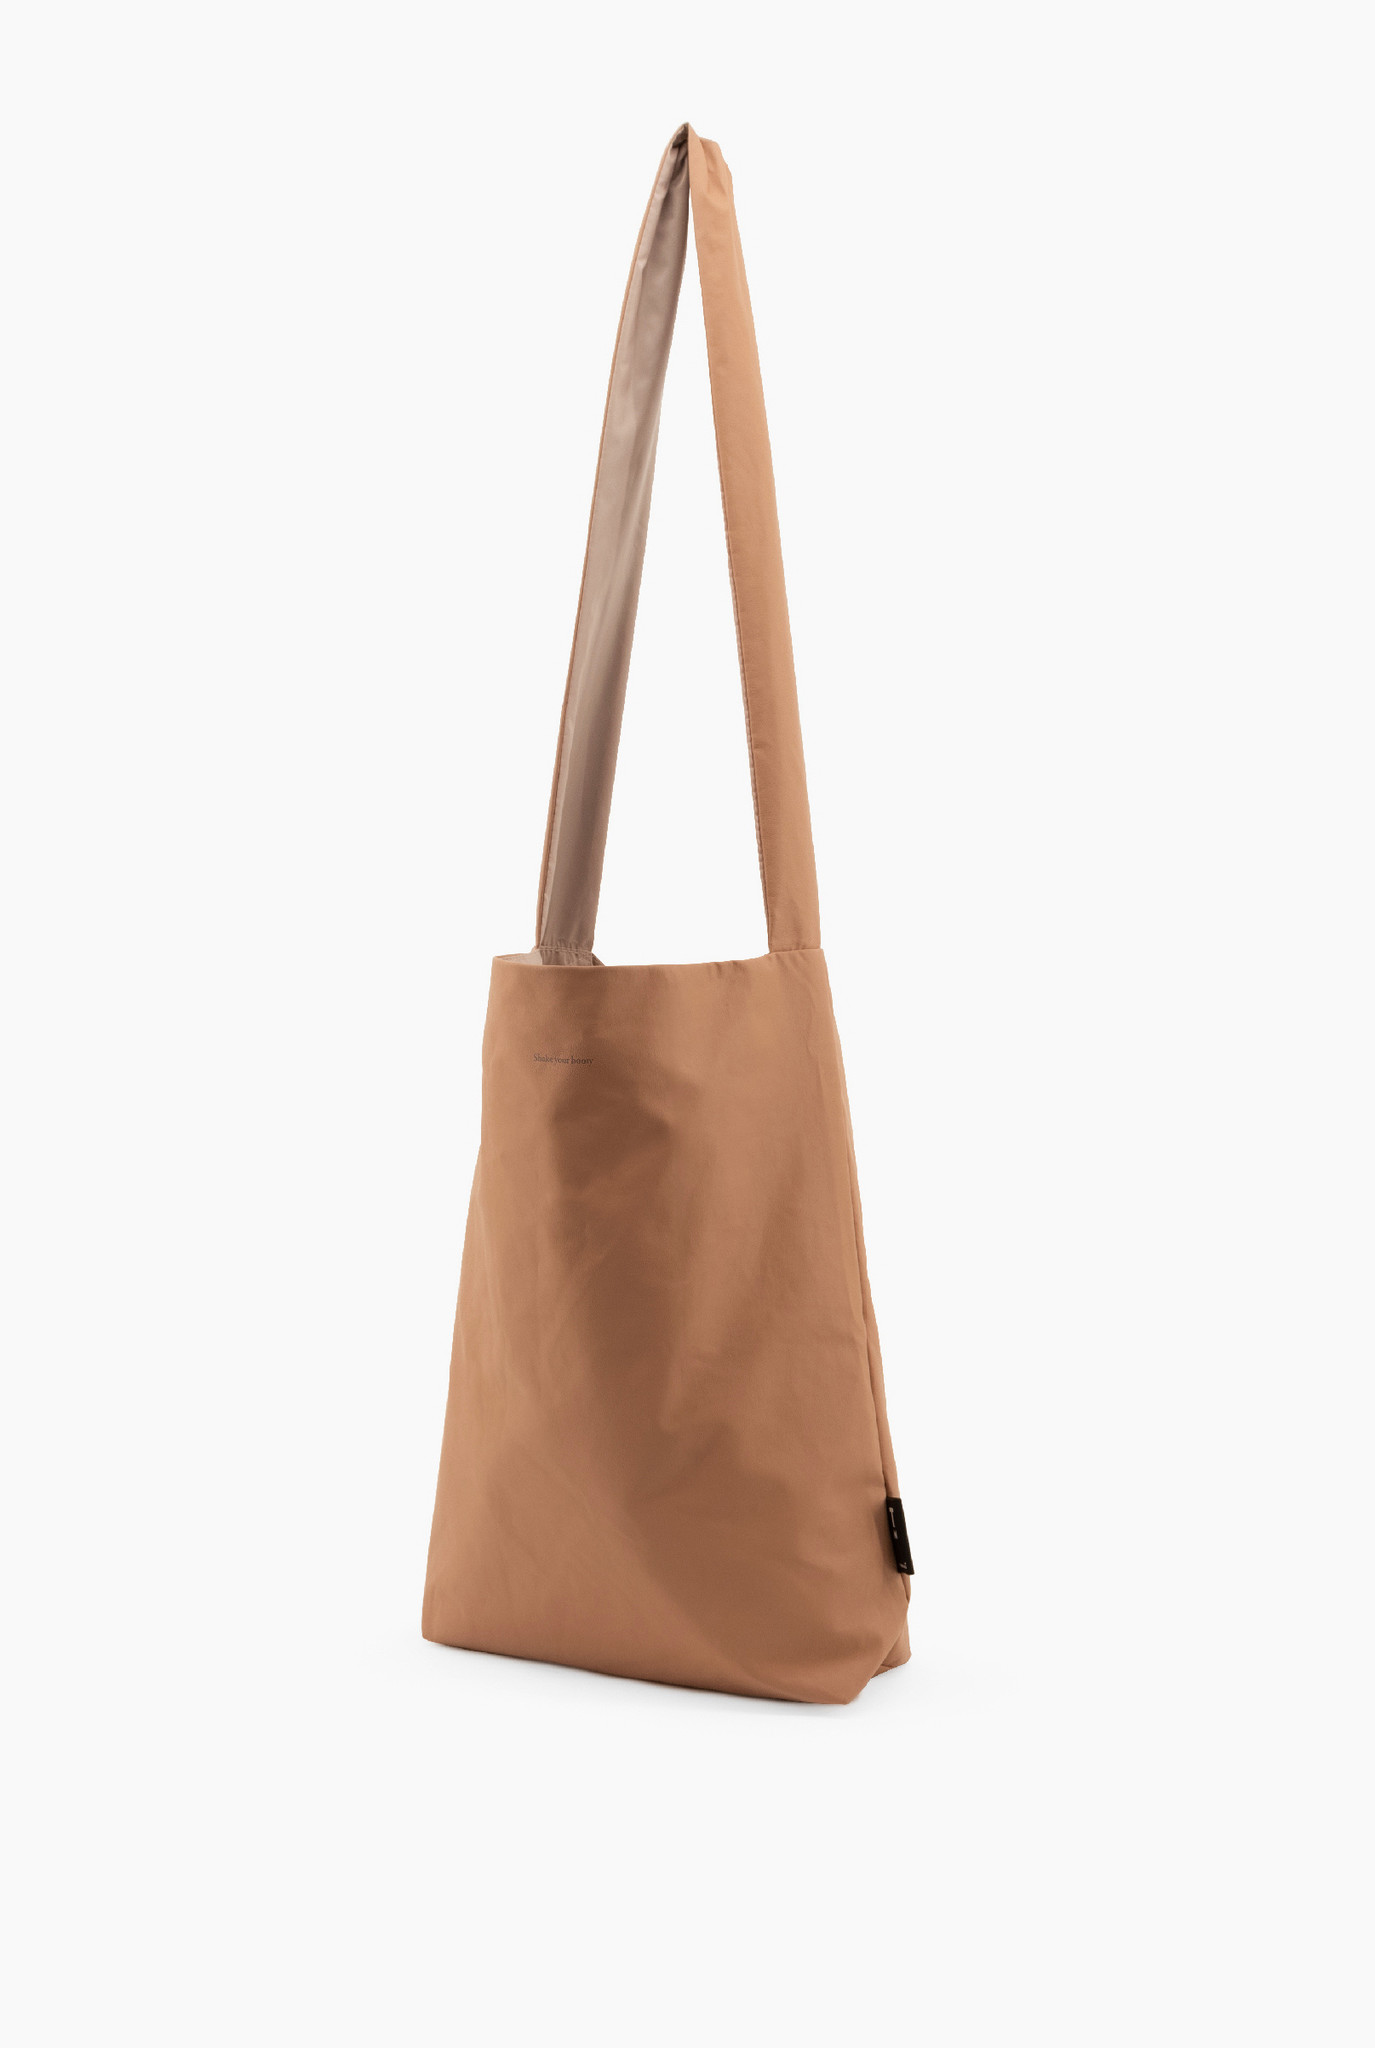 Feel Good Bag - set Earthy Tones (12 pcs.)-5